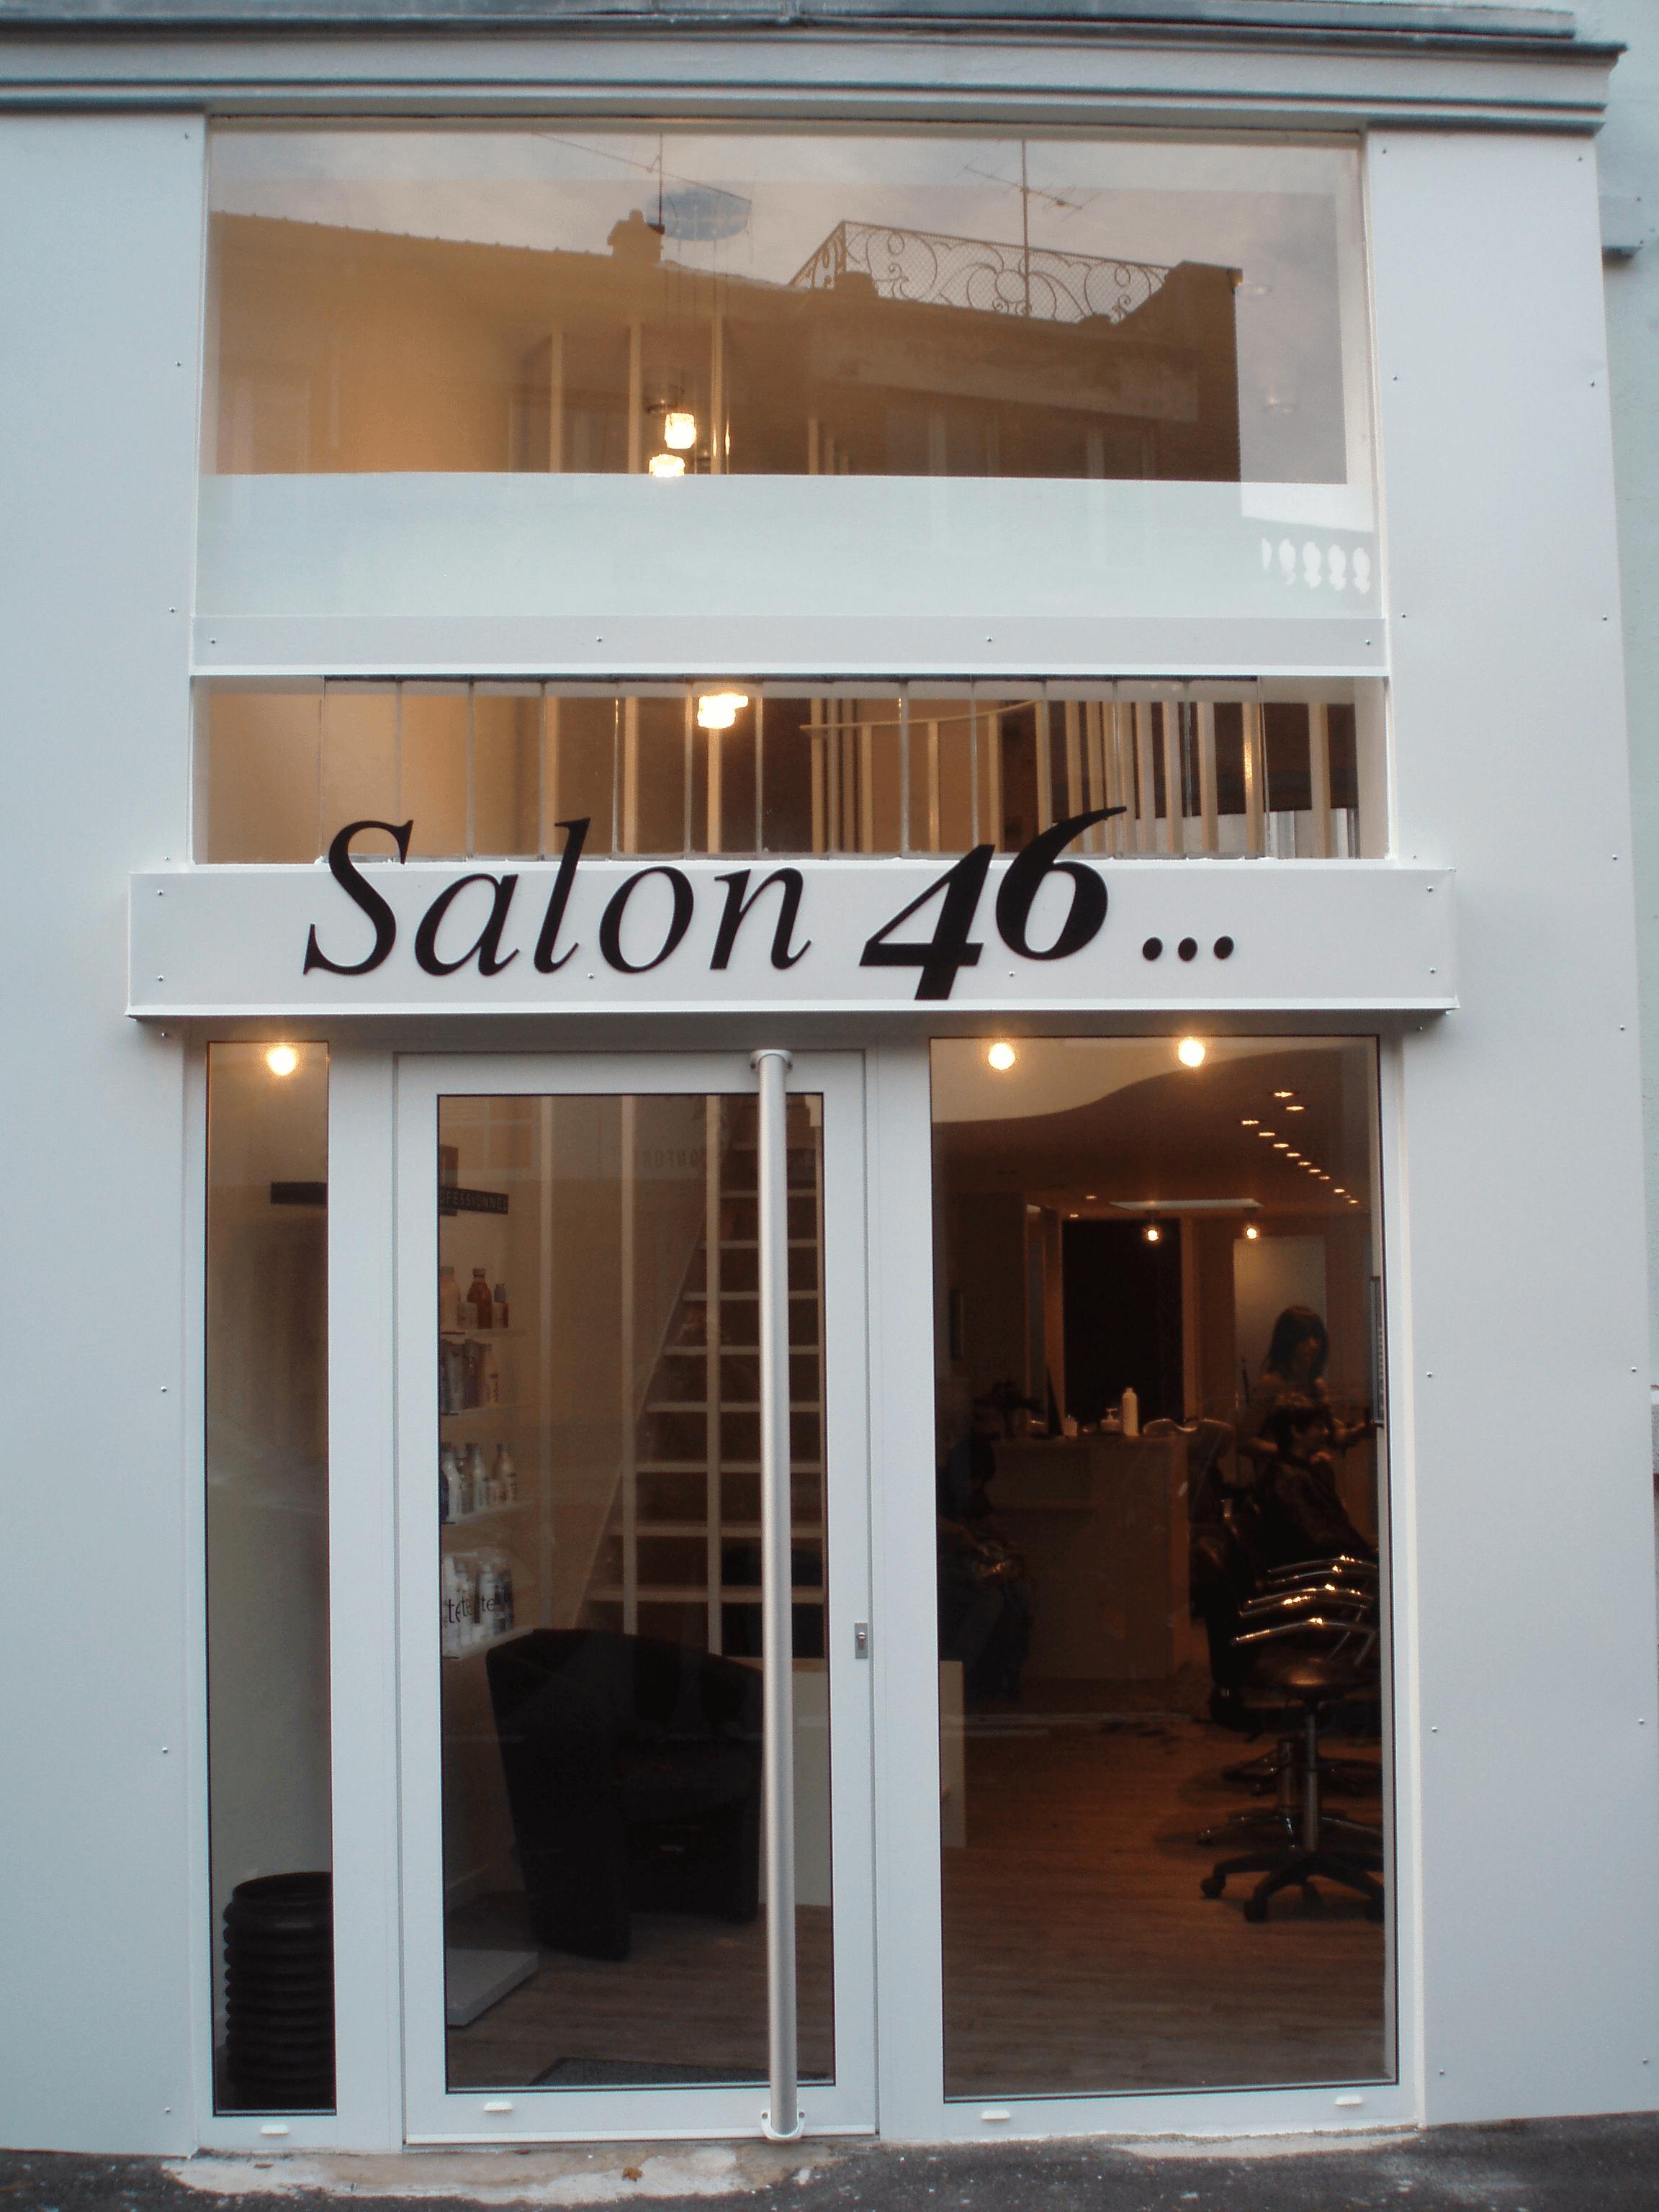 Salon 46 Clermont-Ferrand